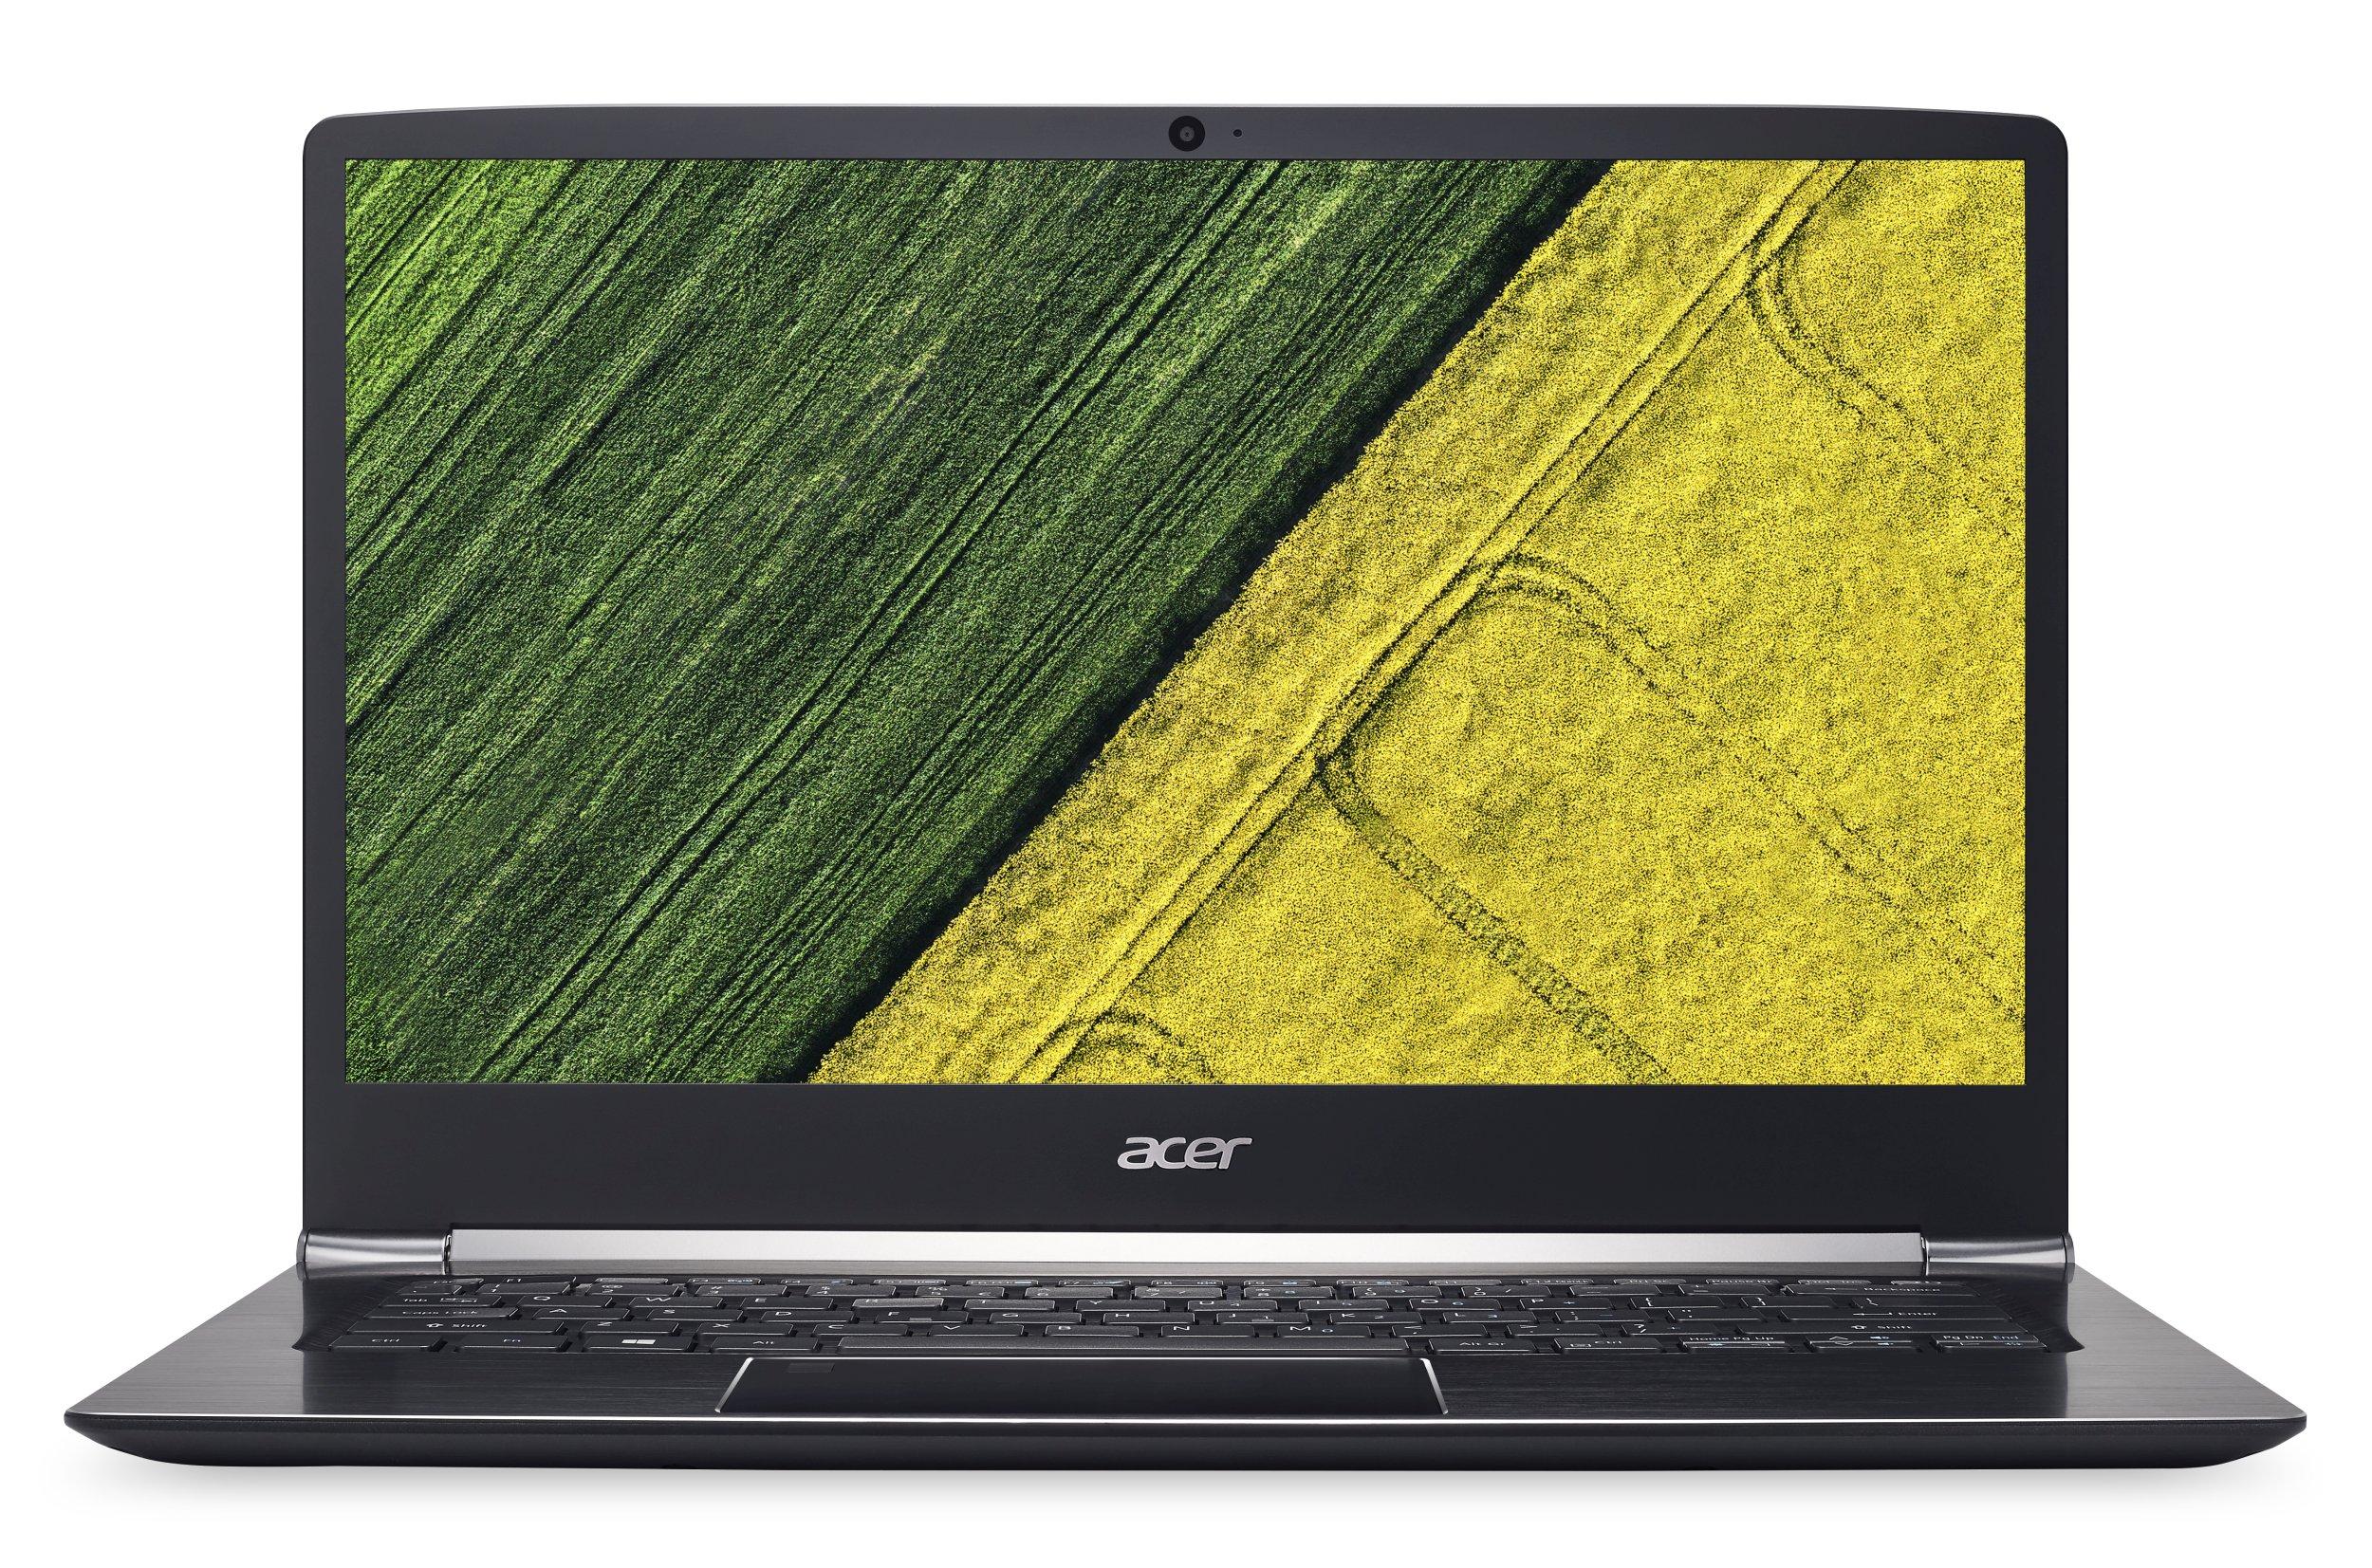 "Acer Swift 5 (SF514-51-5763) i5-7200U/8 GB+N/256GB PCIe SSD M.2+N/A/HD Graphics /14"" FHD lesklý IPS/W10 Home/Black"